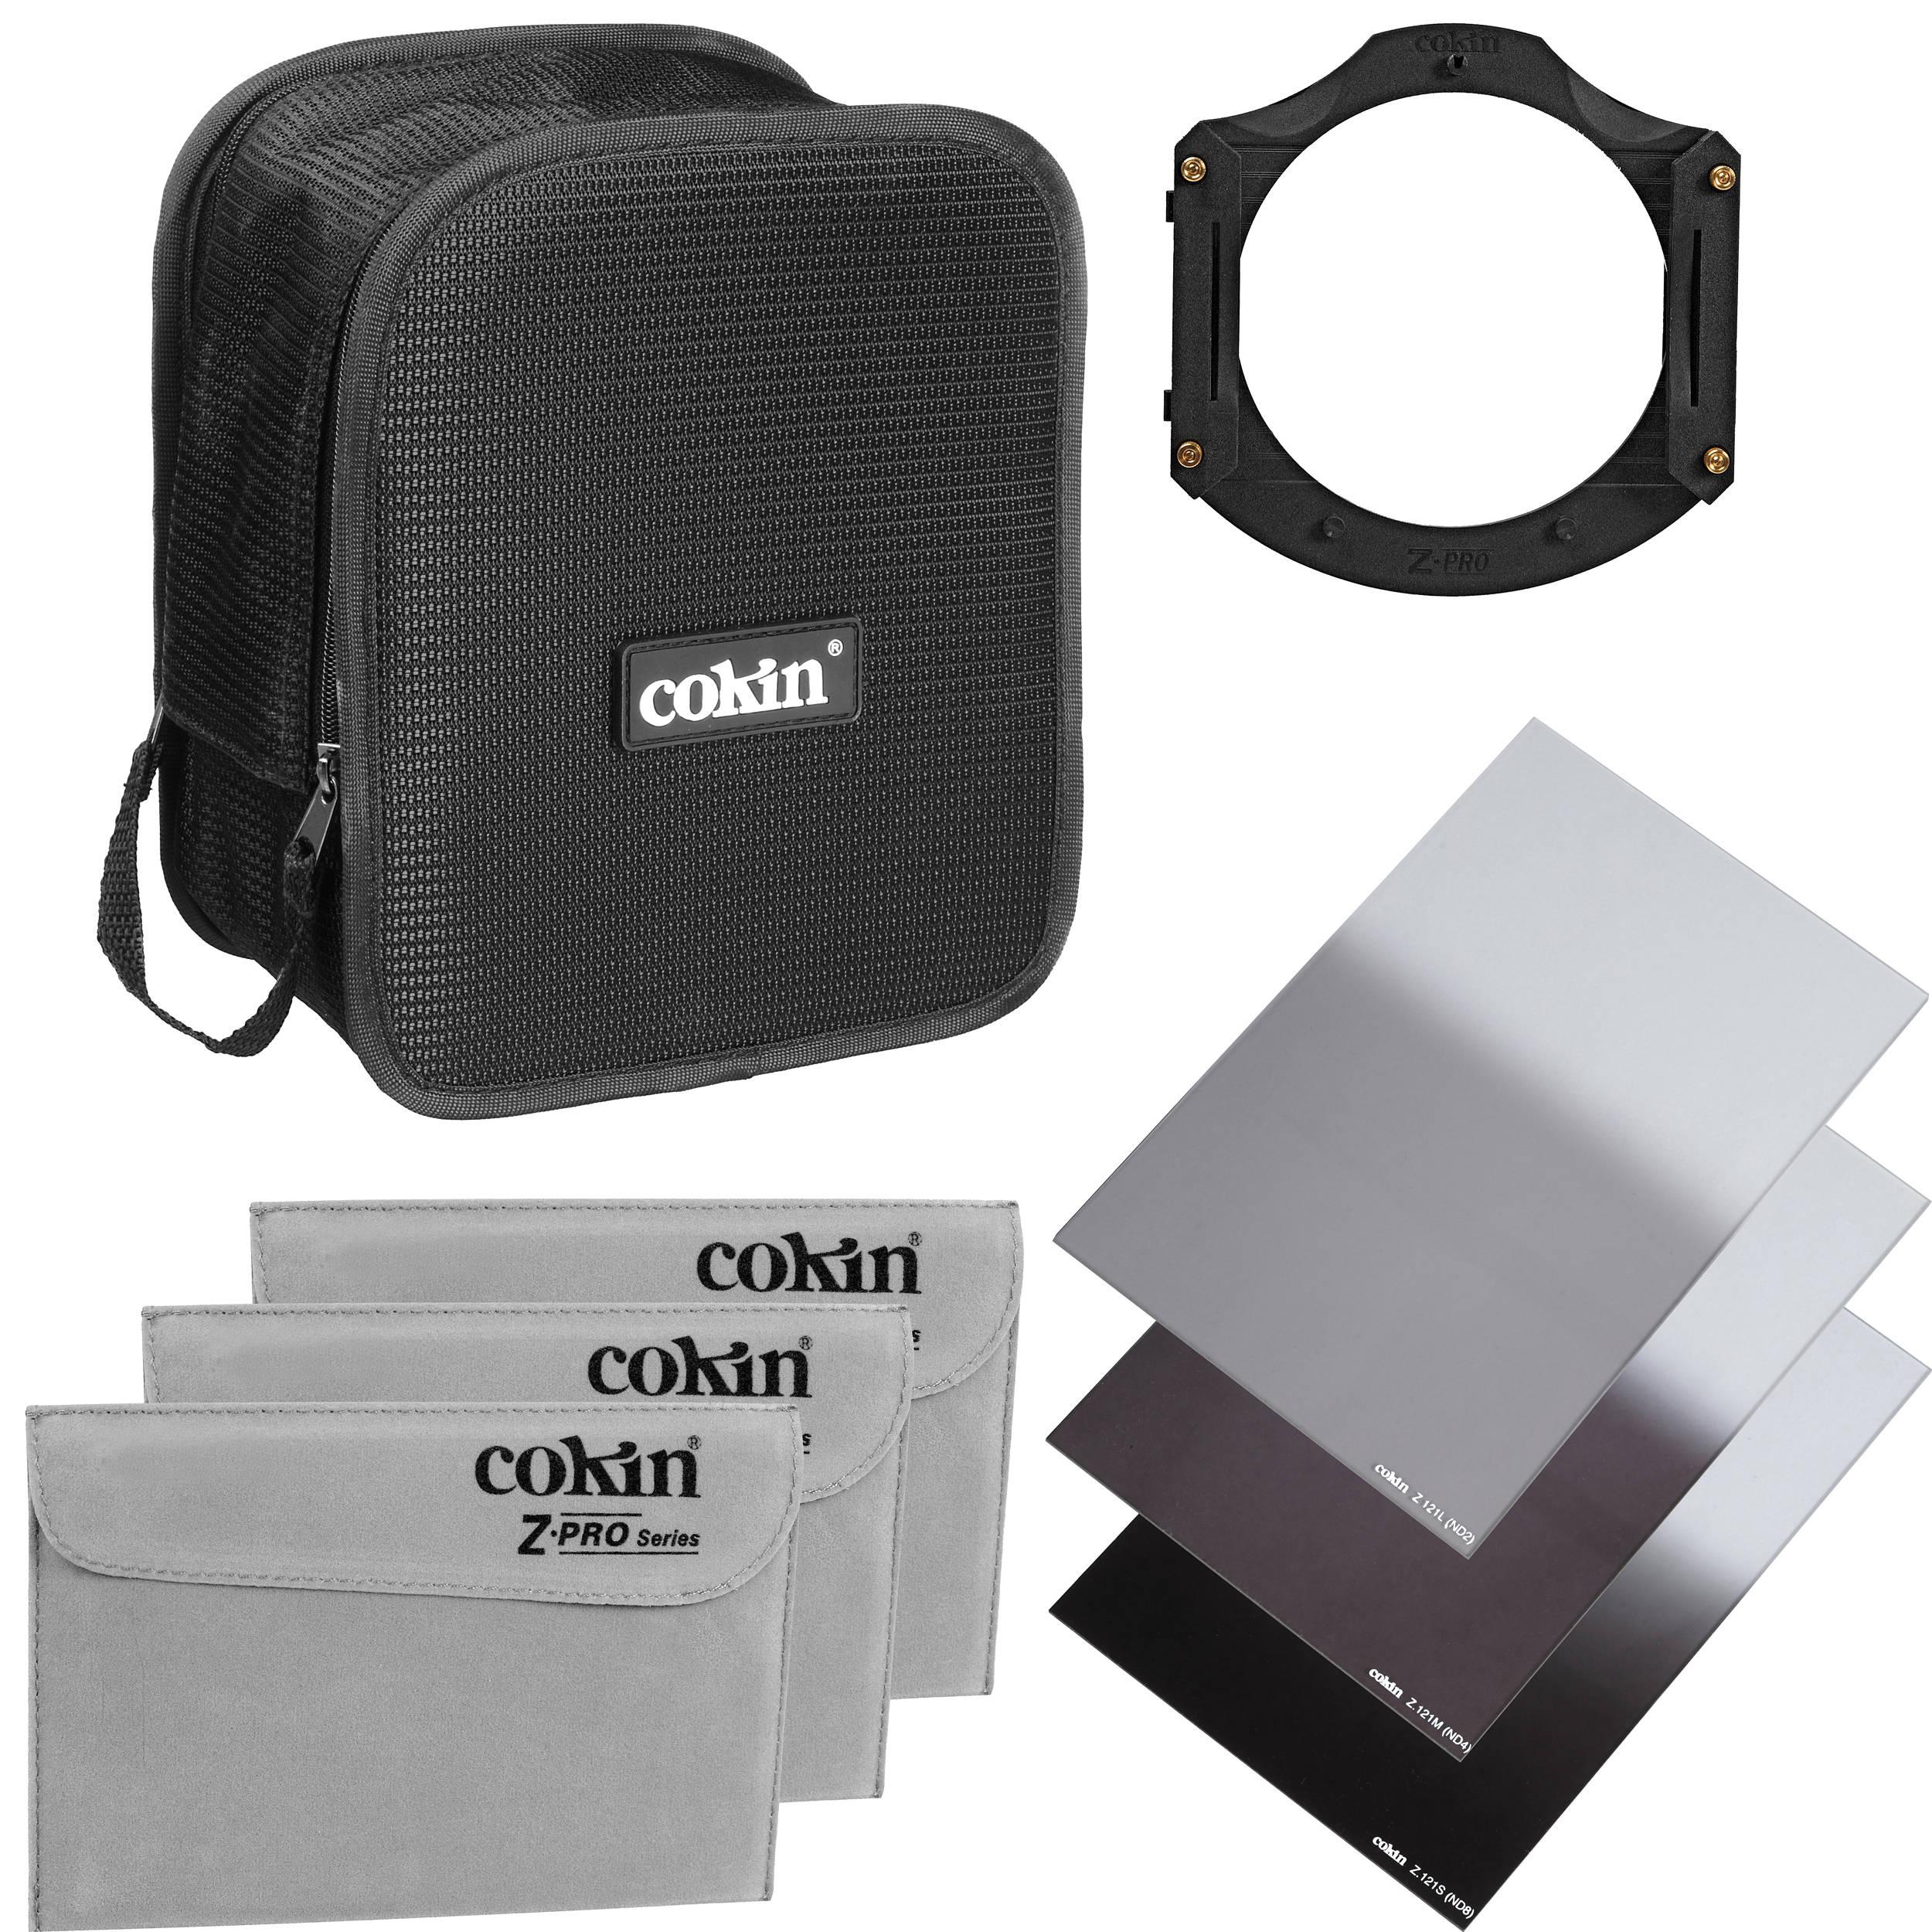 Cokin Z Pro U960 Graduated Neutral Density Filter Kit Cu960 Lee Filters 100x150 Nd 06 Soft